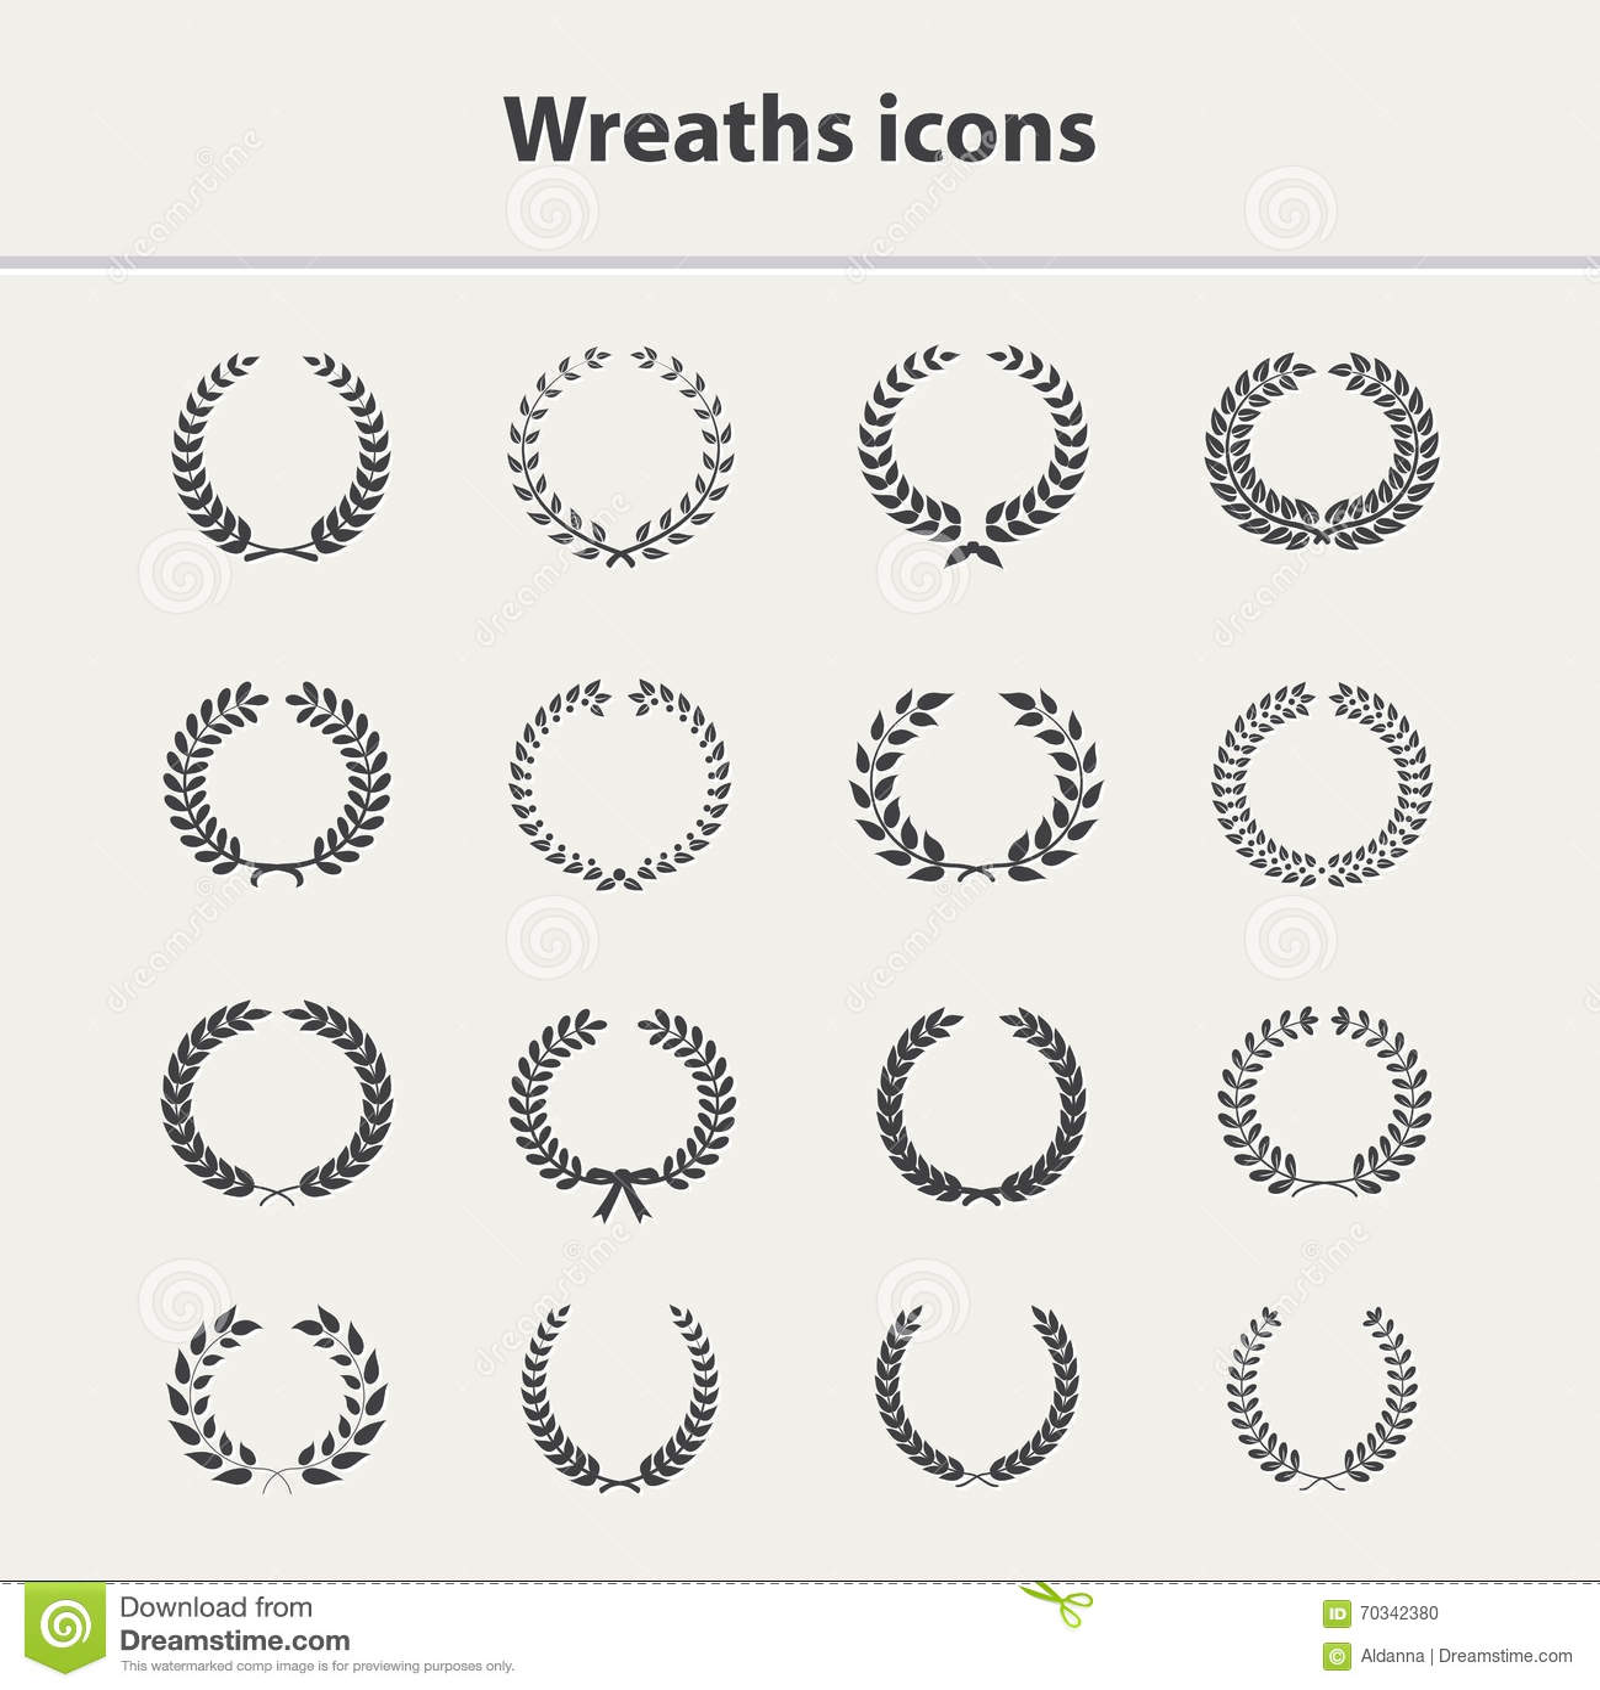 Wreaths icons set